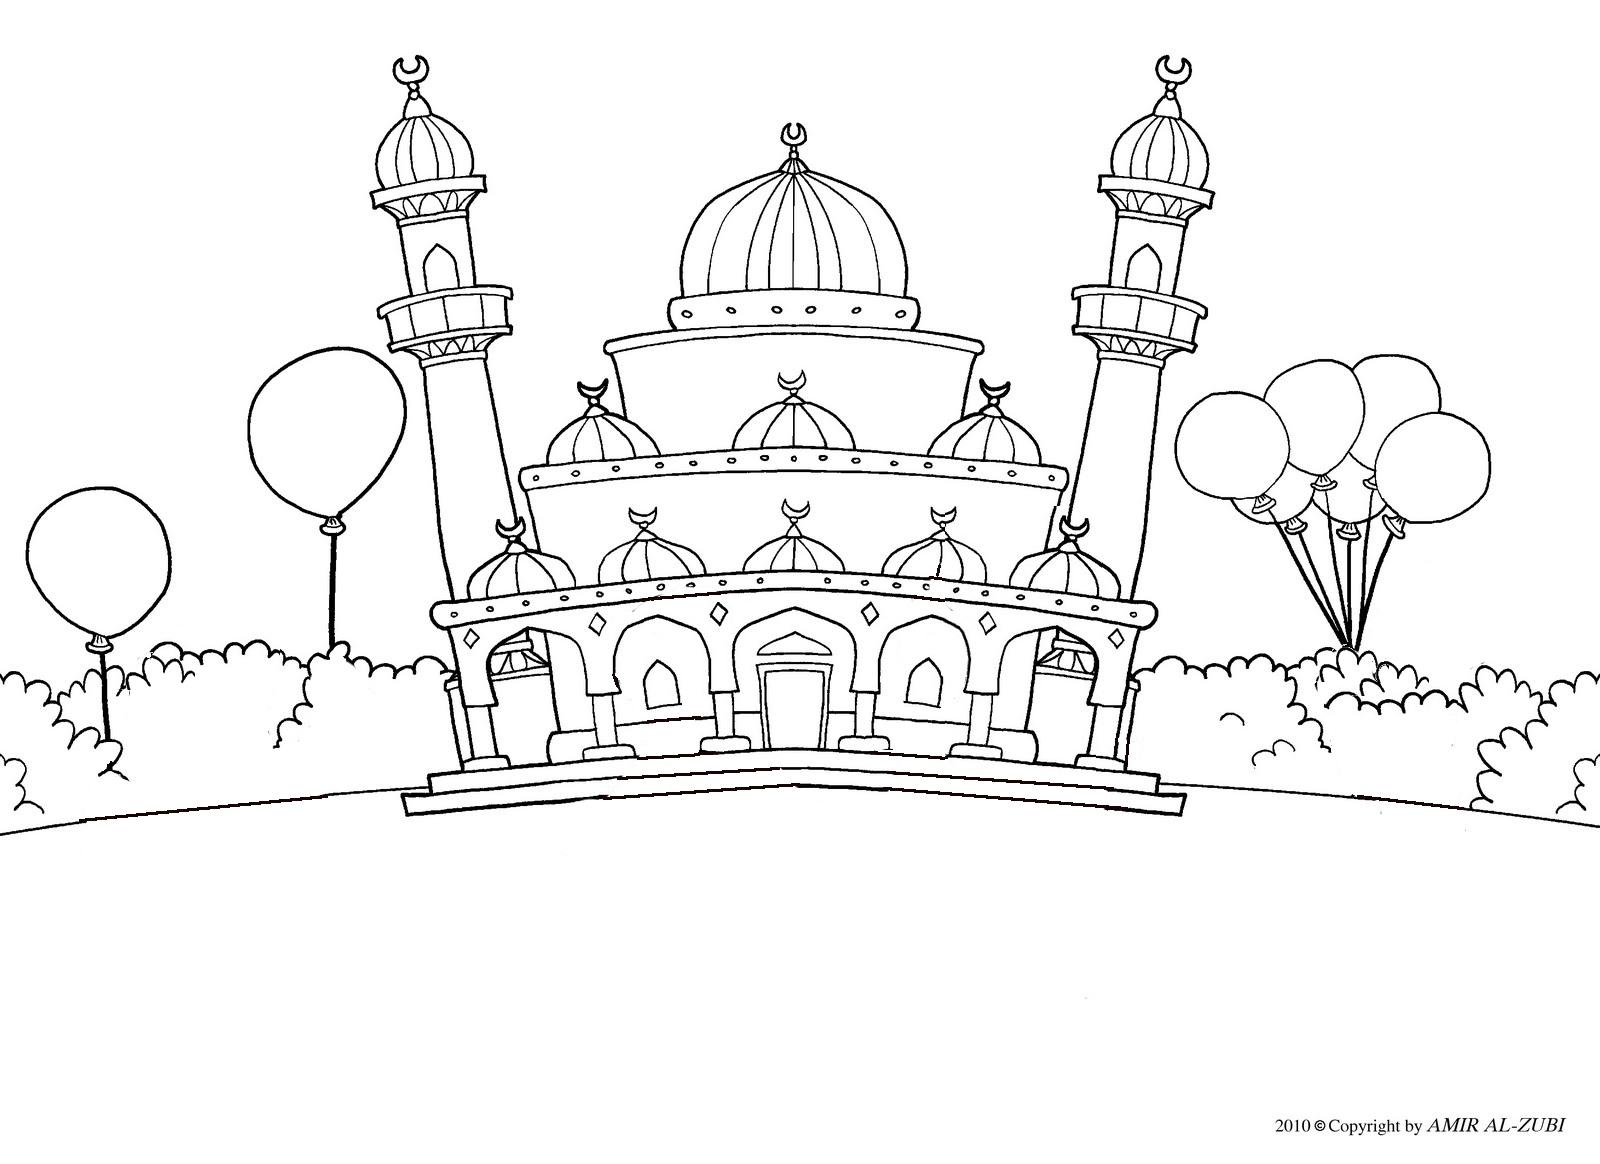 Gambar Mewarnai Masjid Gambar Mewarnai 14 Modern Home Revolution